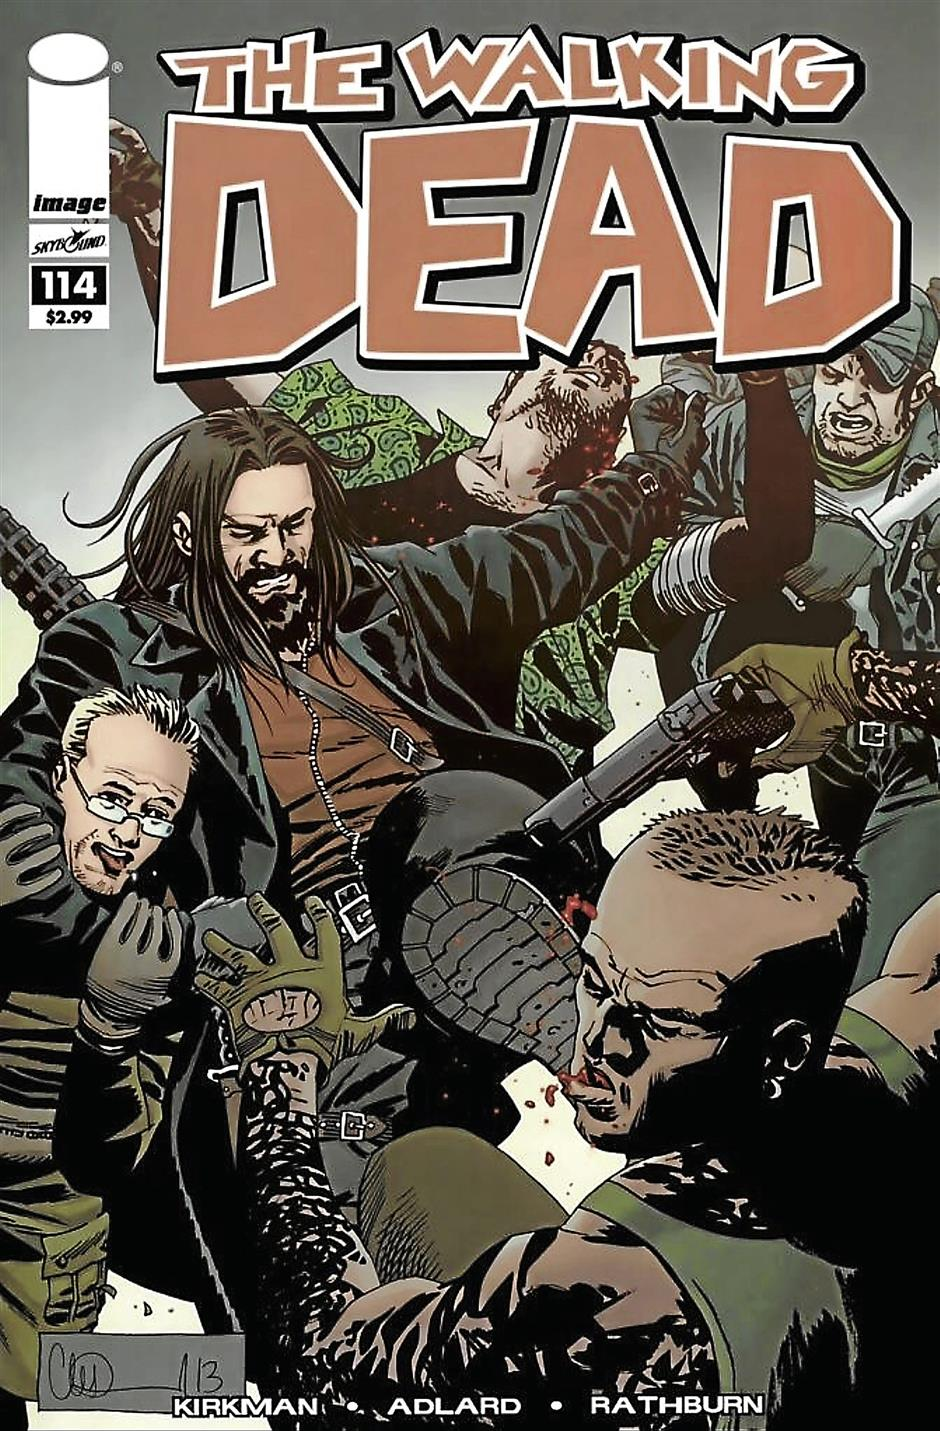 The Walking Dead #114Creators: Robert Kirkman, Charlie AdlardPublisher: Image Comics